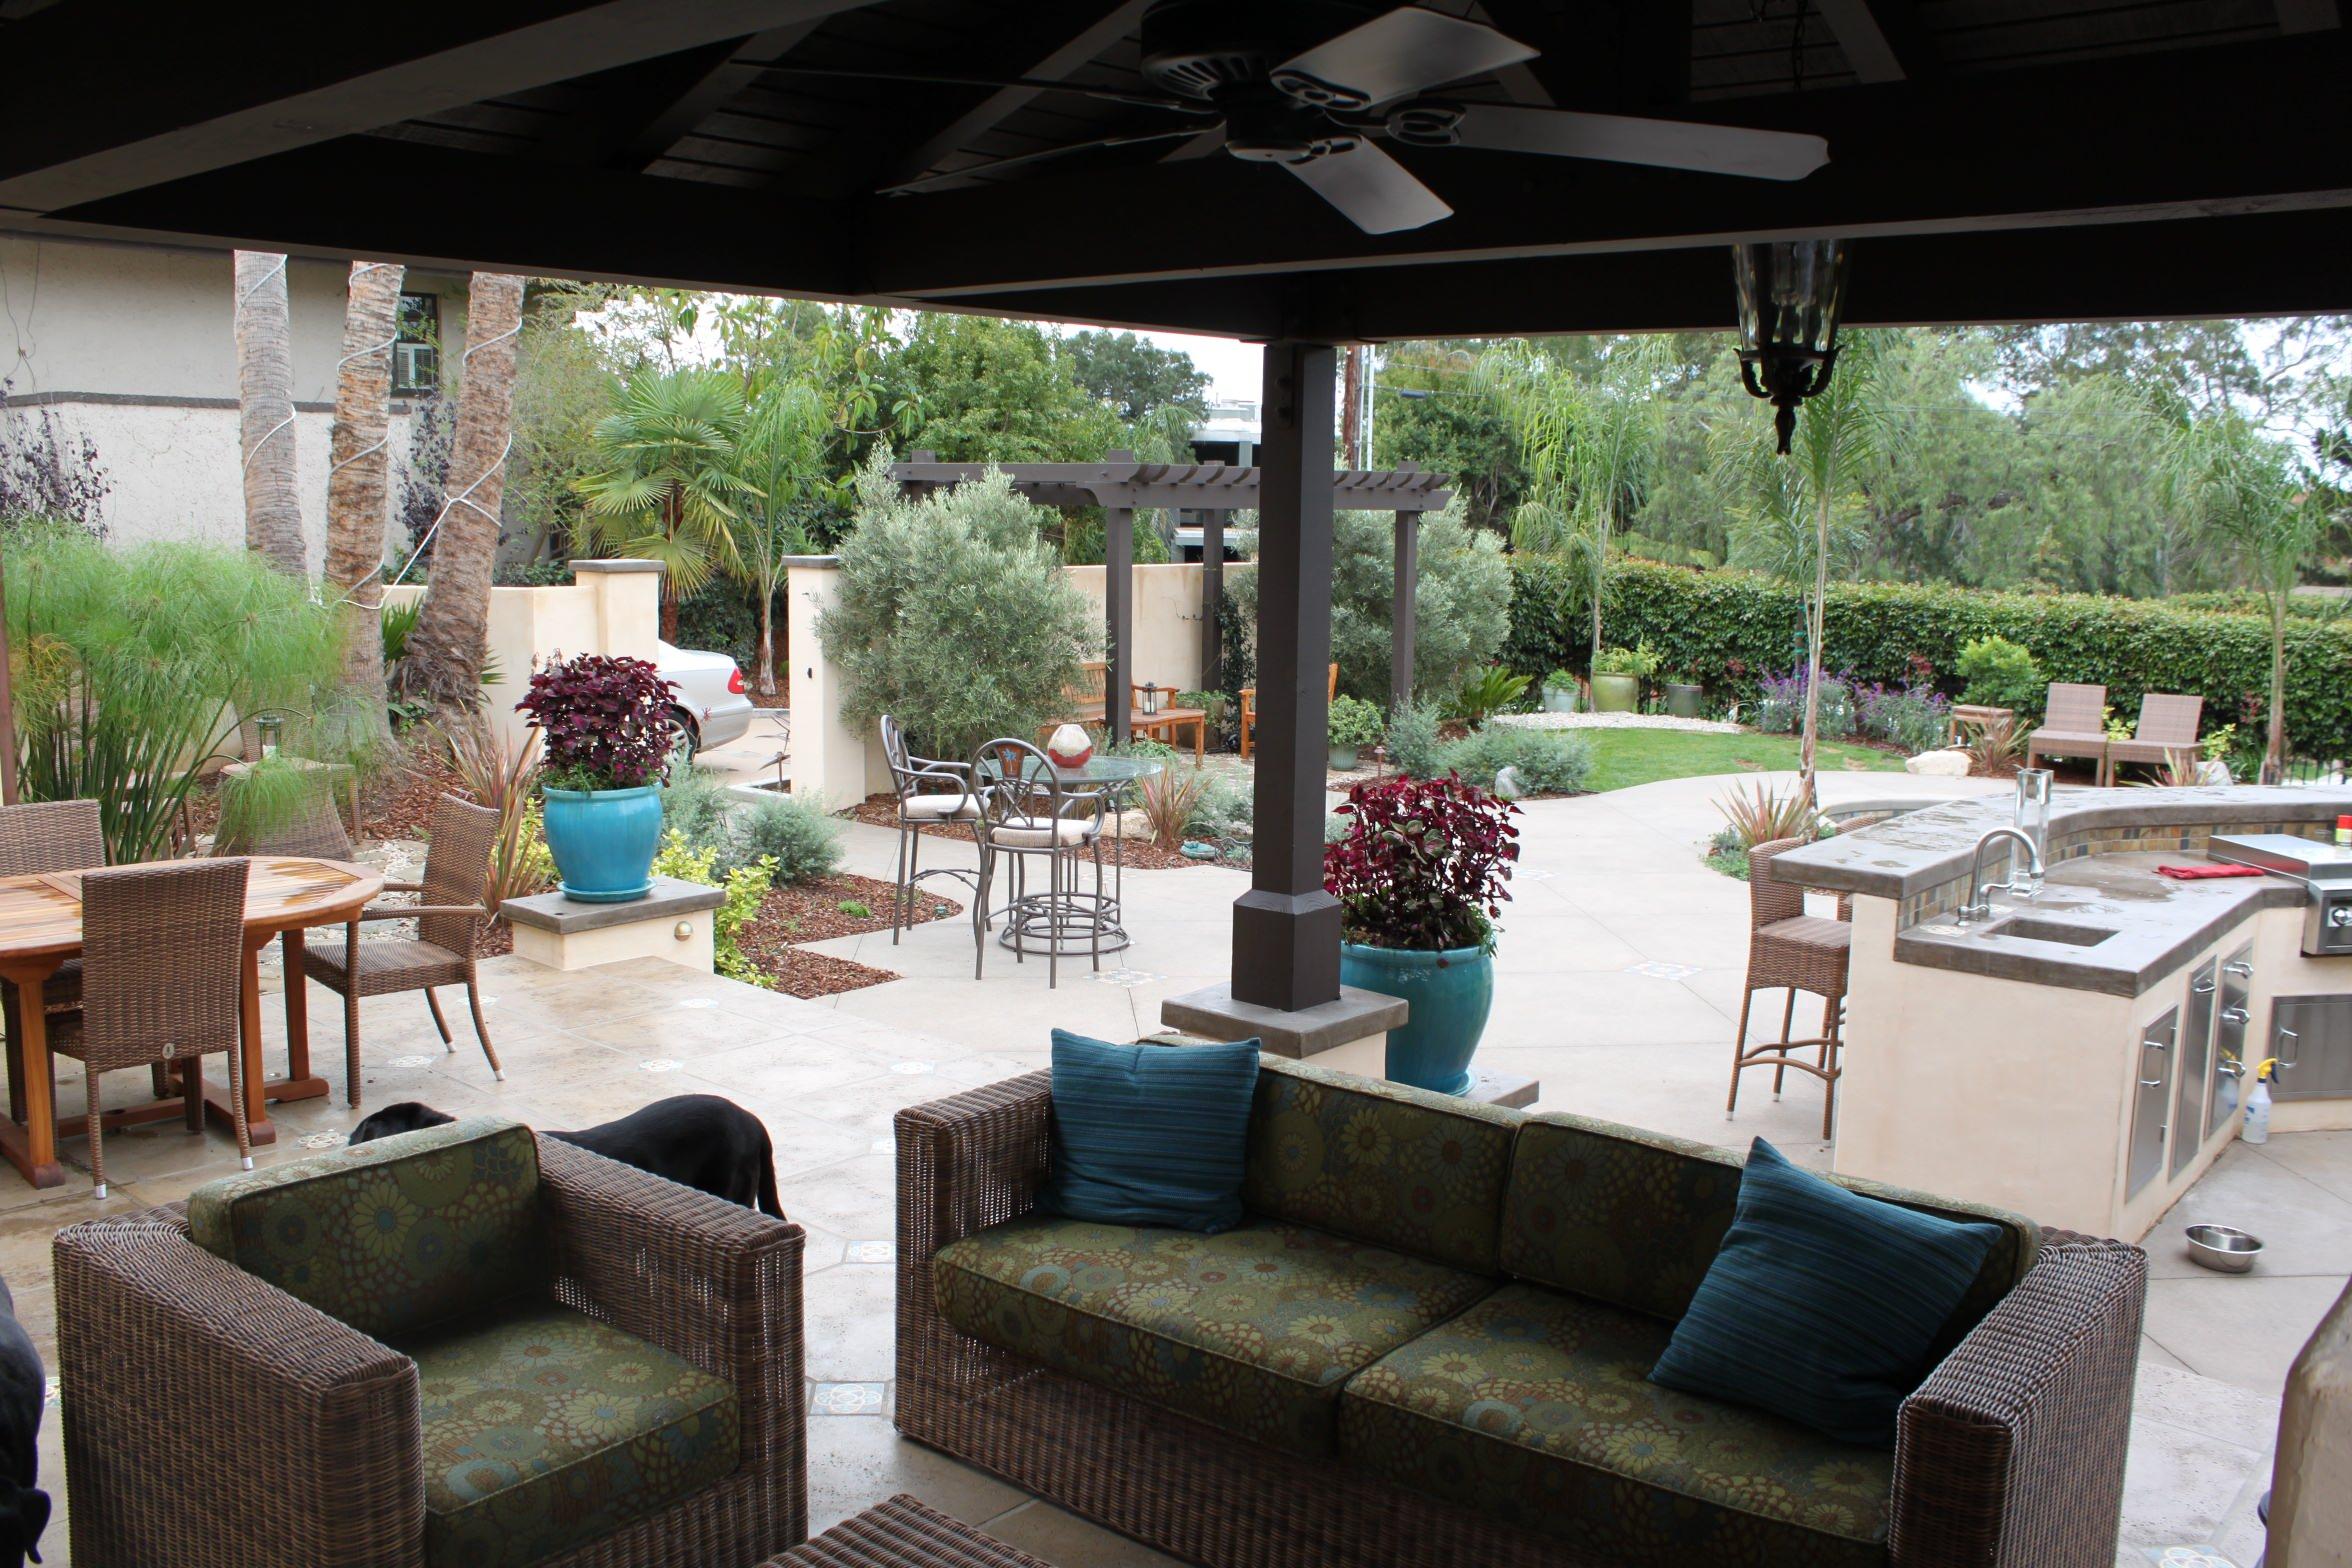 Cabana and Fireplace Lounge Area Overlooking Backyard